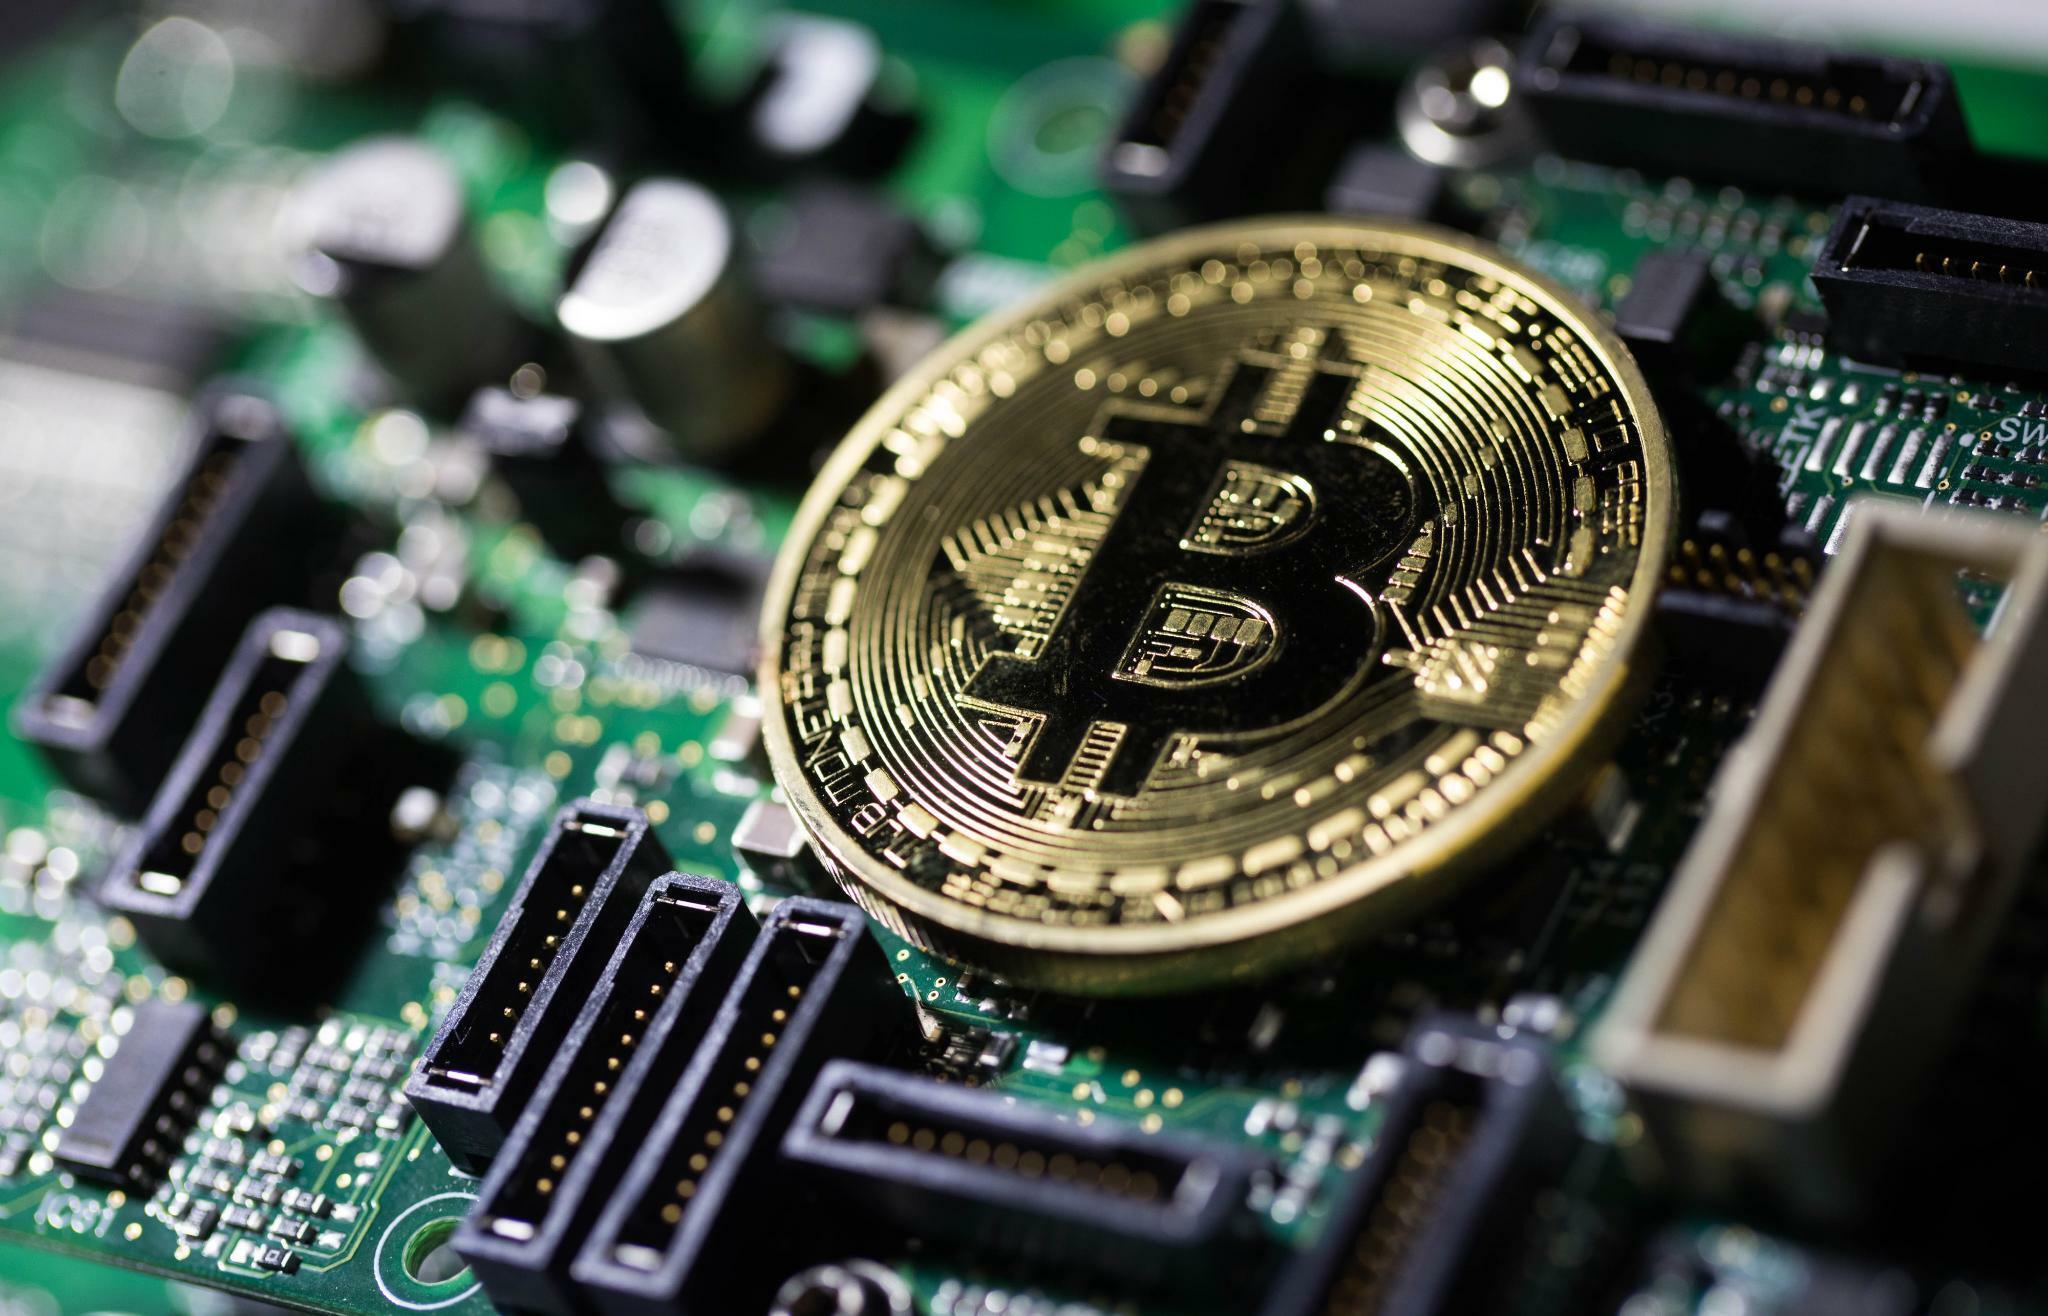 ich bin reich durch bitcoin bitcoin trading master: simulator skid reload